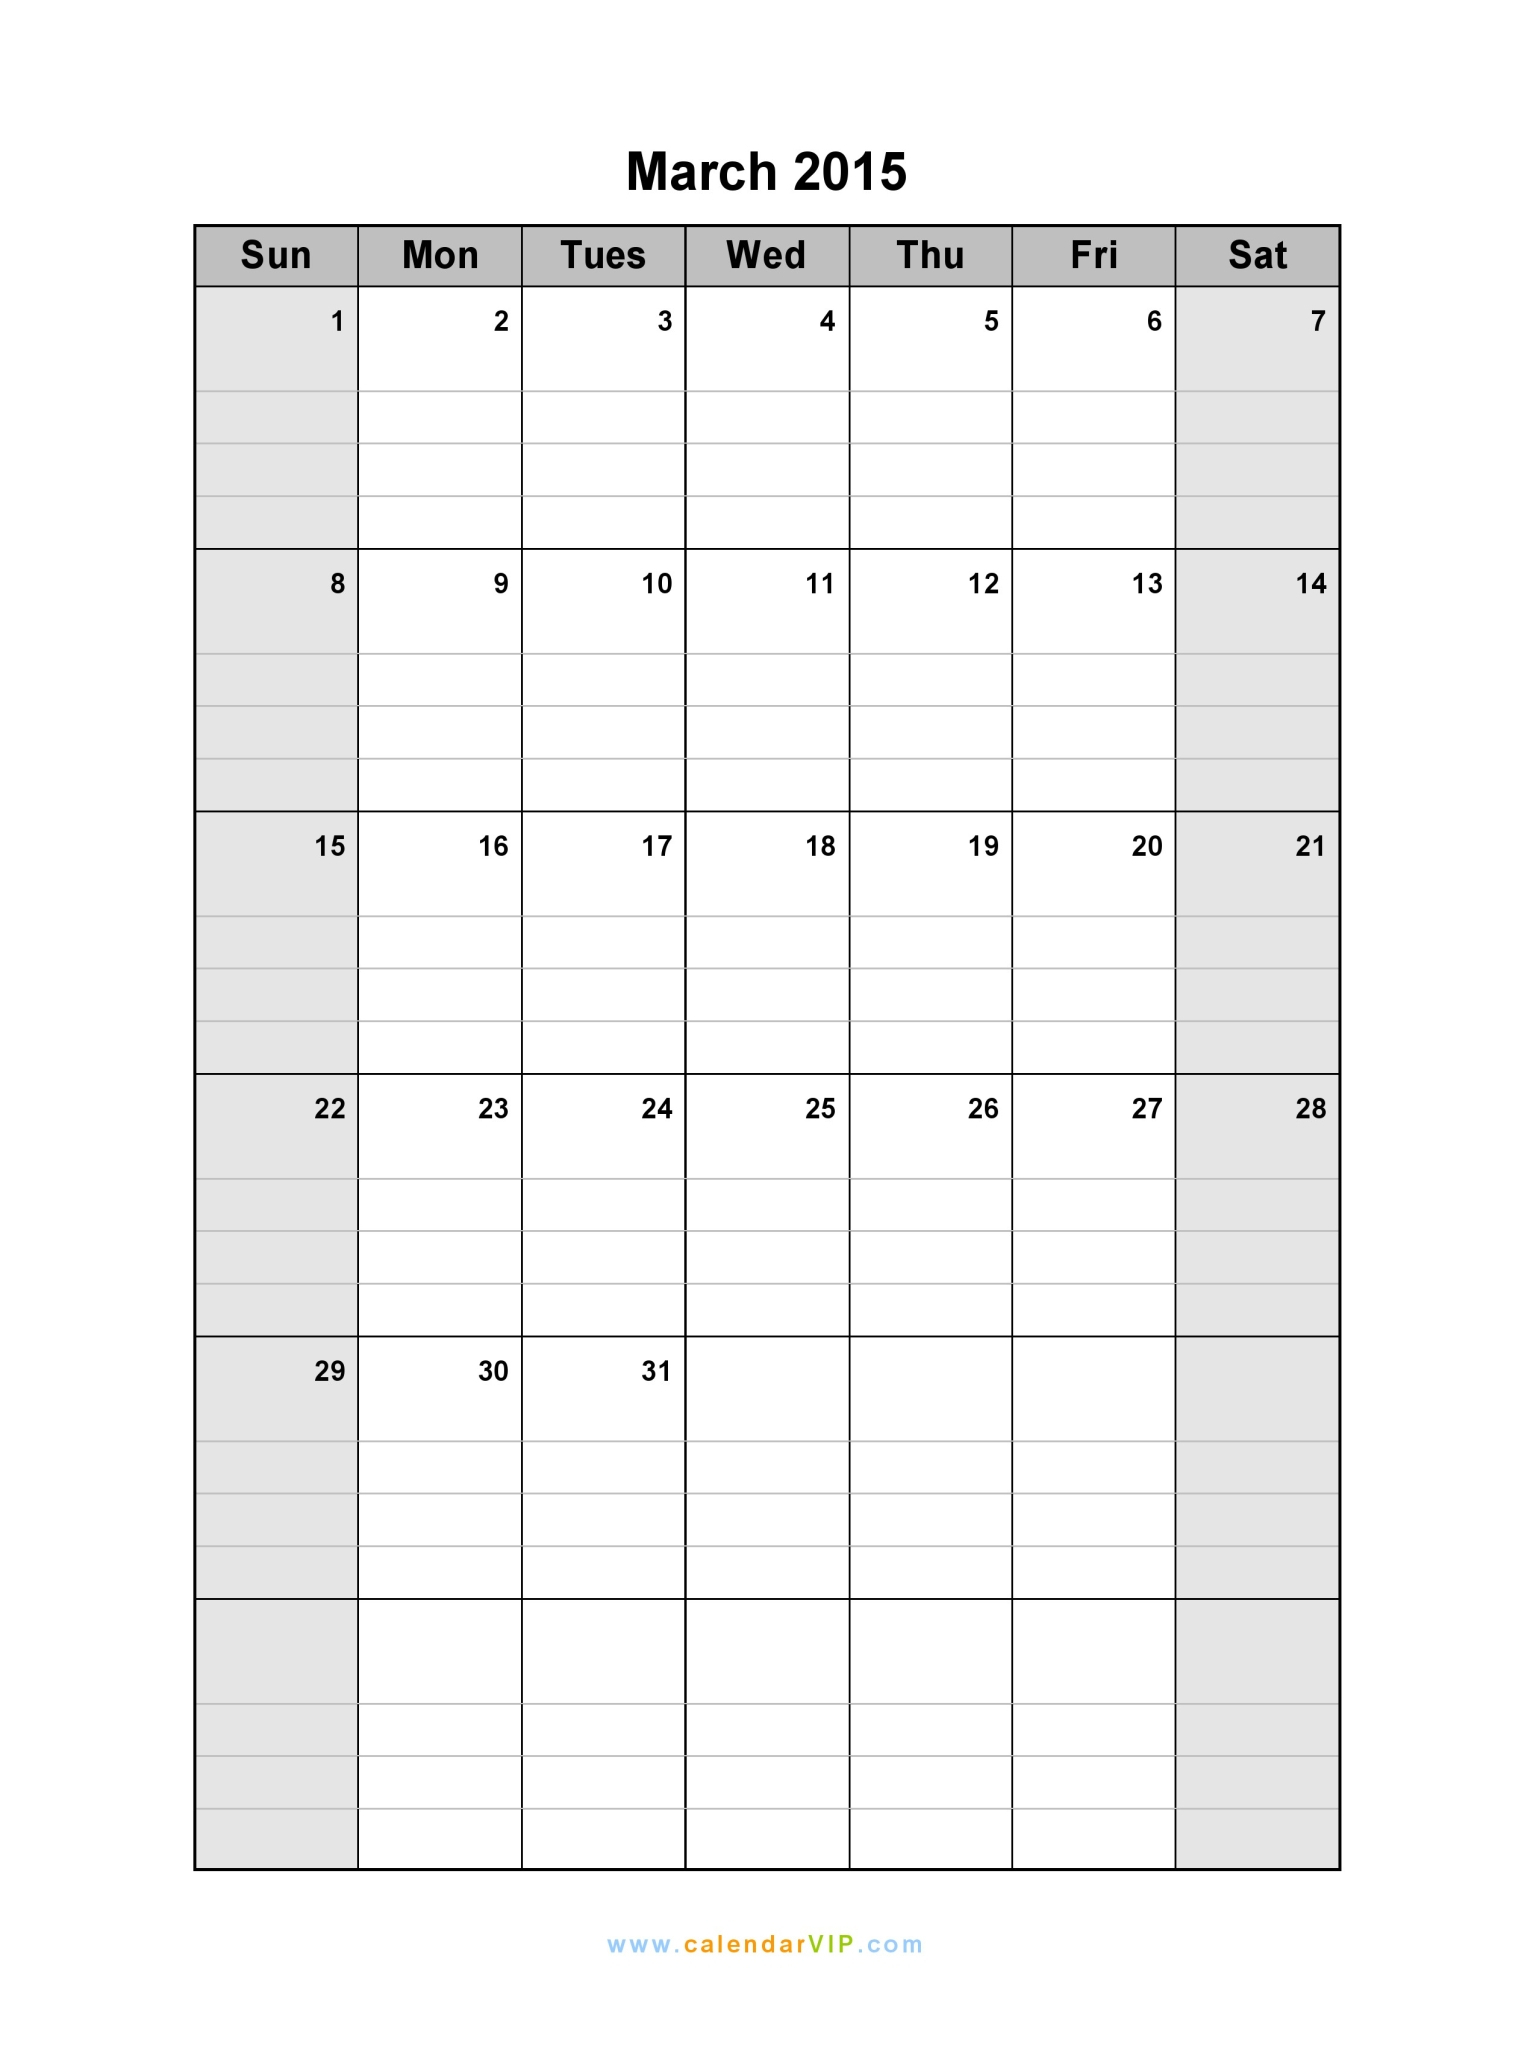 March 2015 Calendar - Blank Printable Calendar Template In Pdf Word